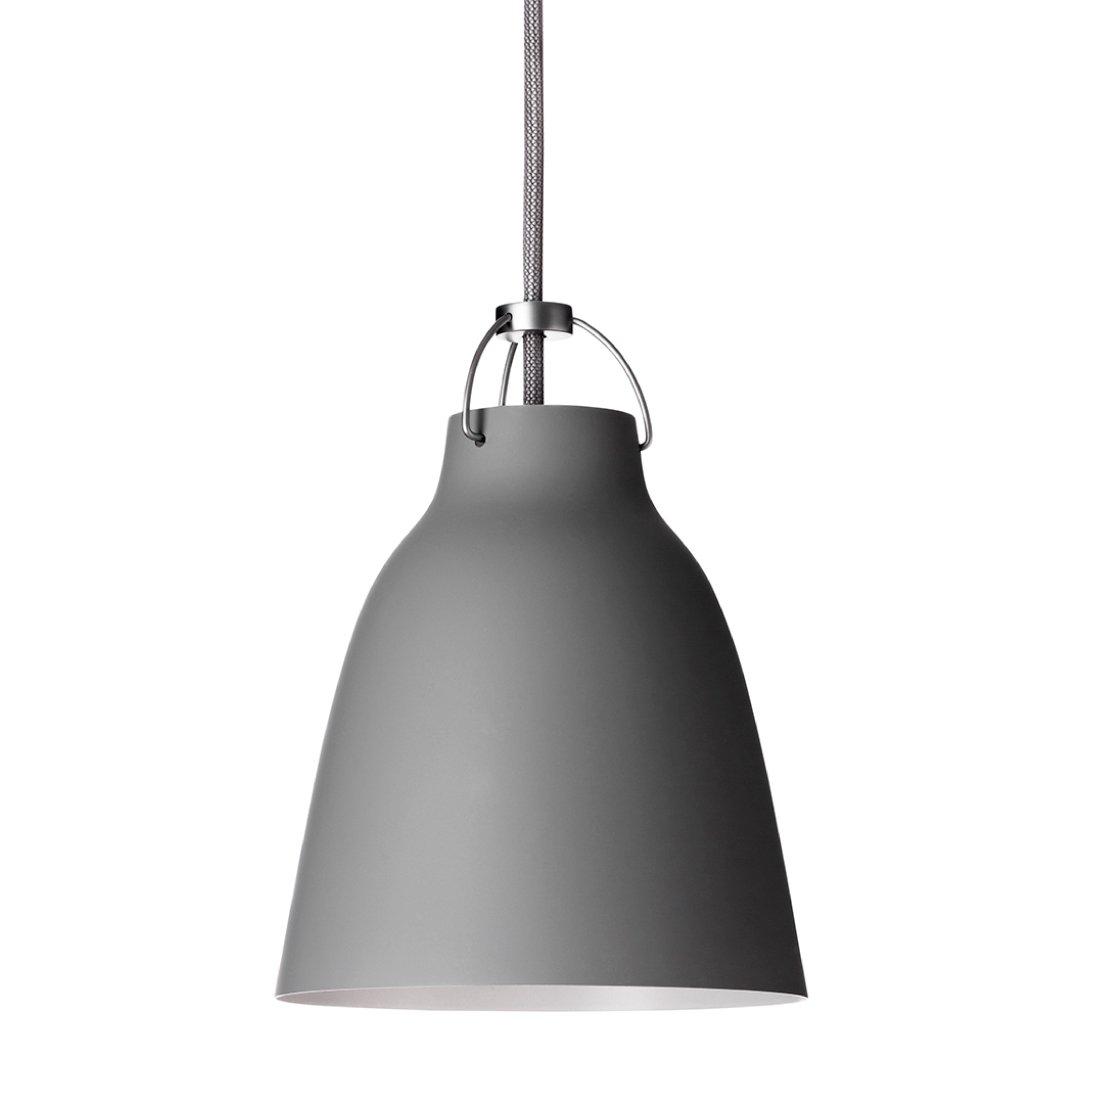 Lightyears Caravaggio P1 Grijs - Licht Grijs